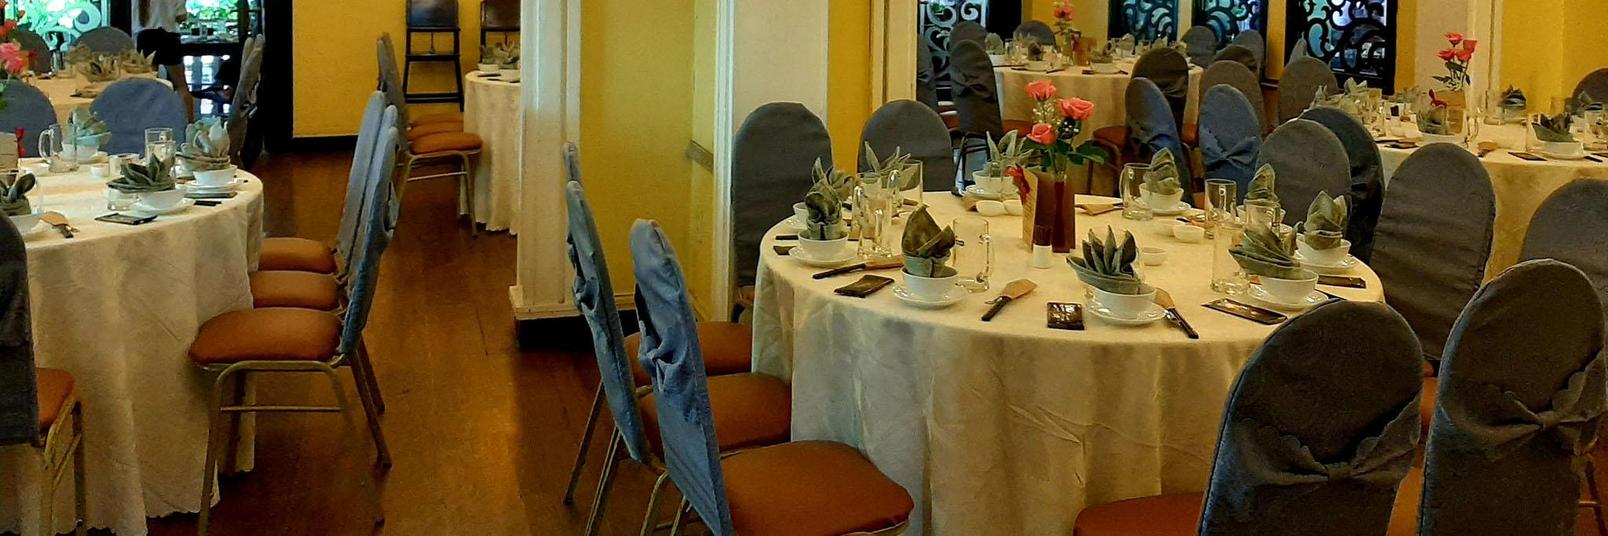 Đồng Restaurant